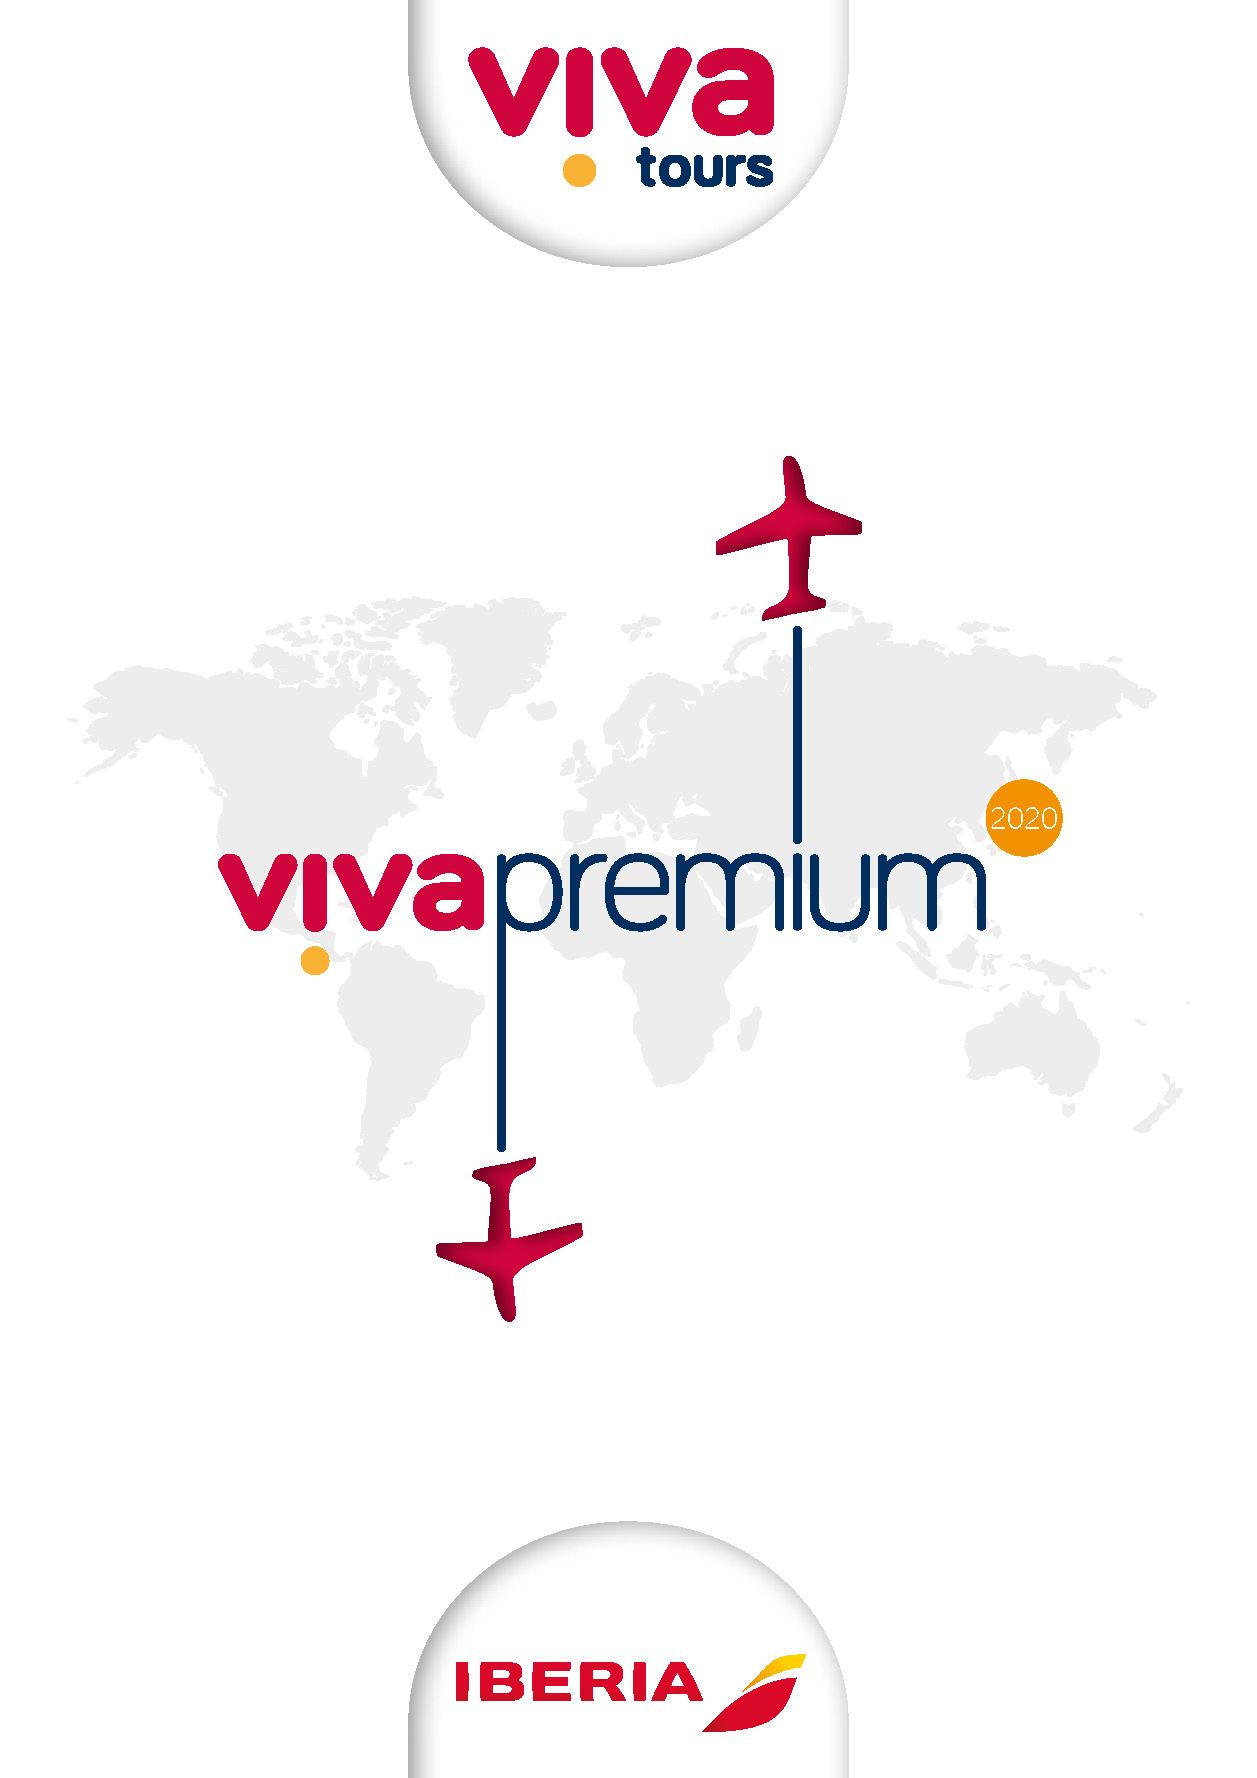 Catalogo Viva Tours Viajes Premium 2020